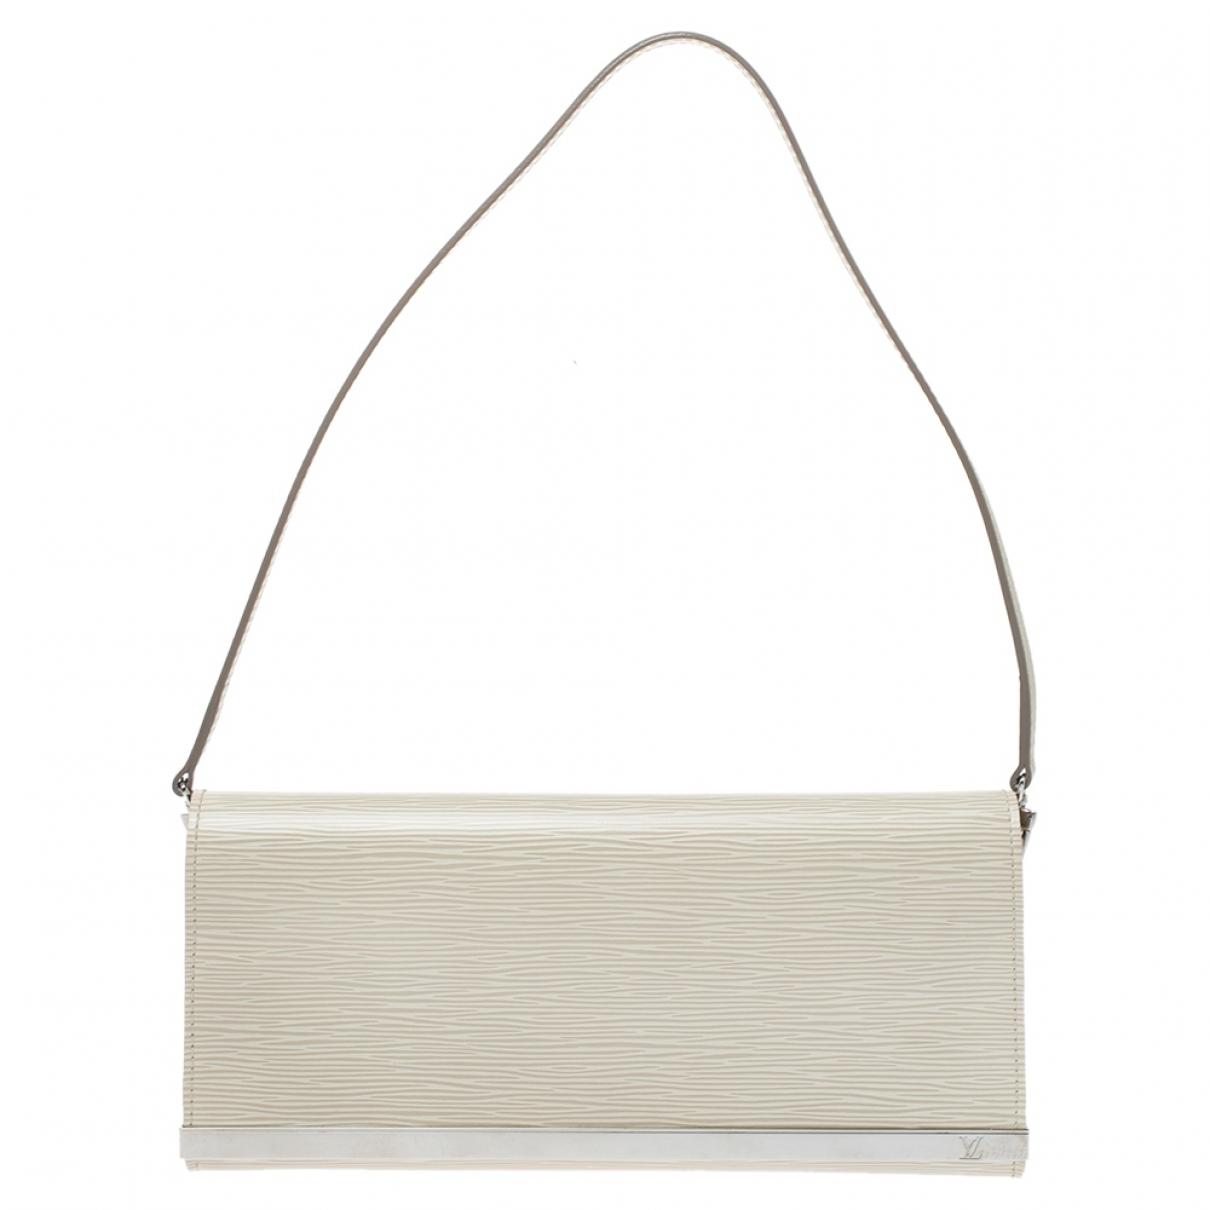 Louis Vuitton Sevigné White Leather Clutch bag for Women N